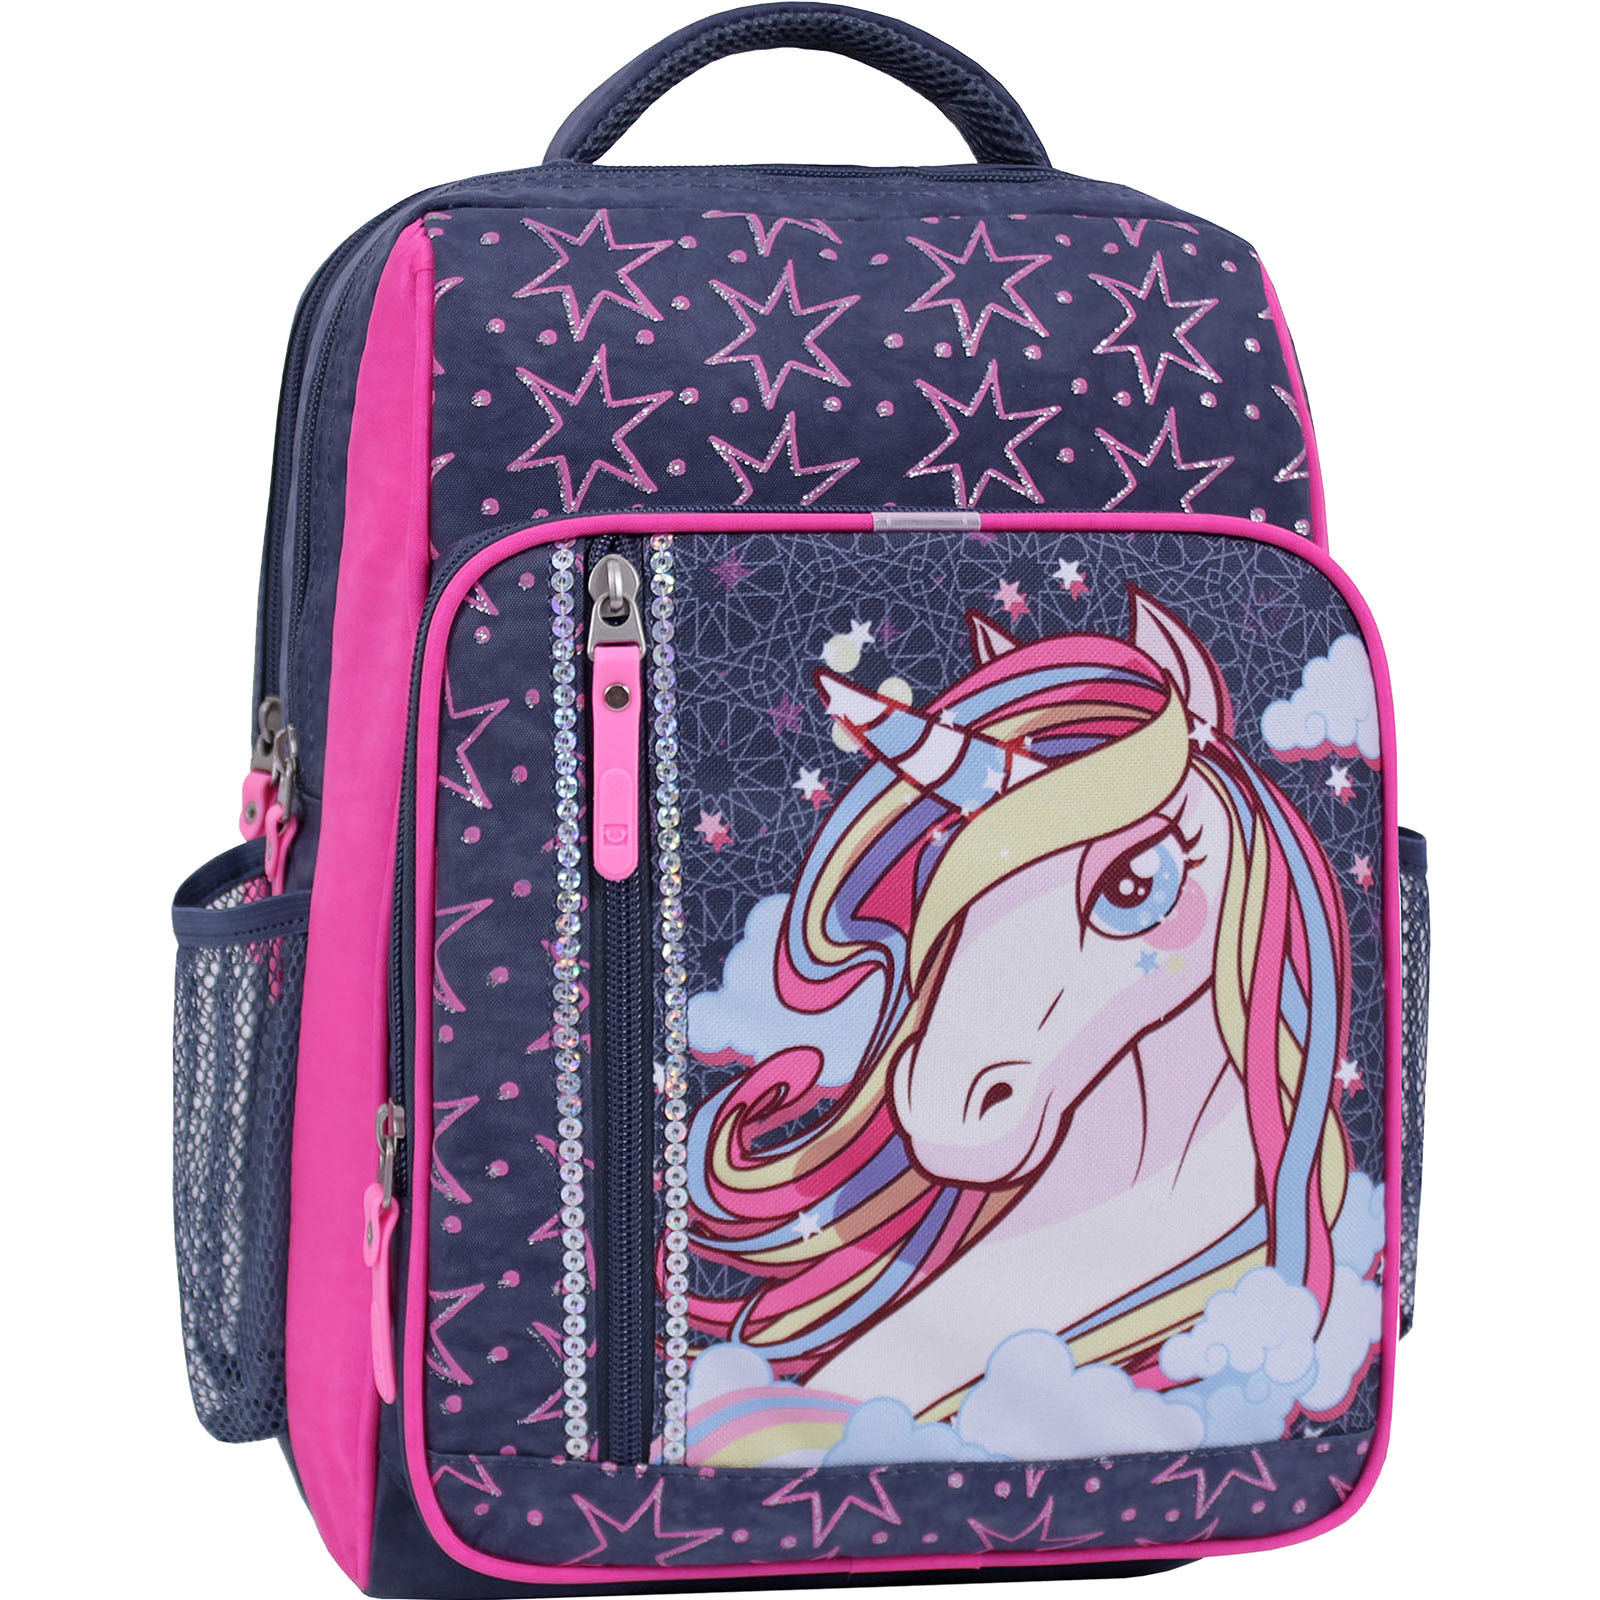 Школьные рюкзаки Рюкзак школьный Bagland Школьник 8 л. 321 серый 511 (00112702) IMG_1591_суб.511_.JPG